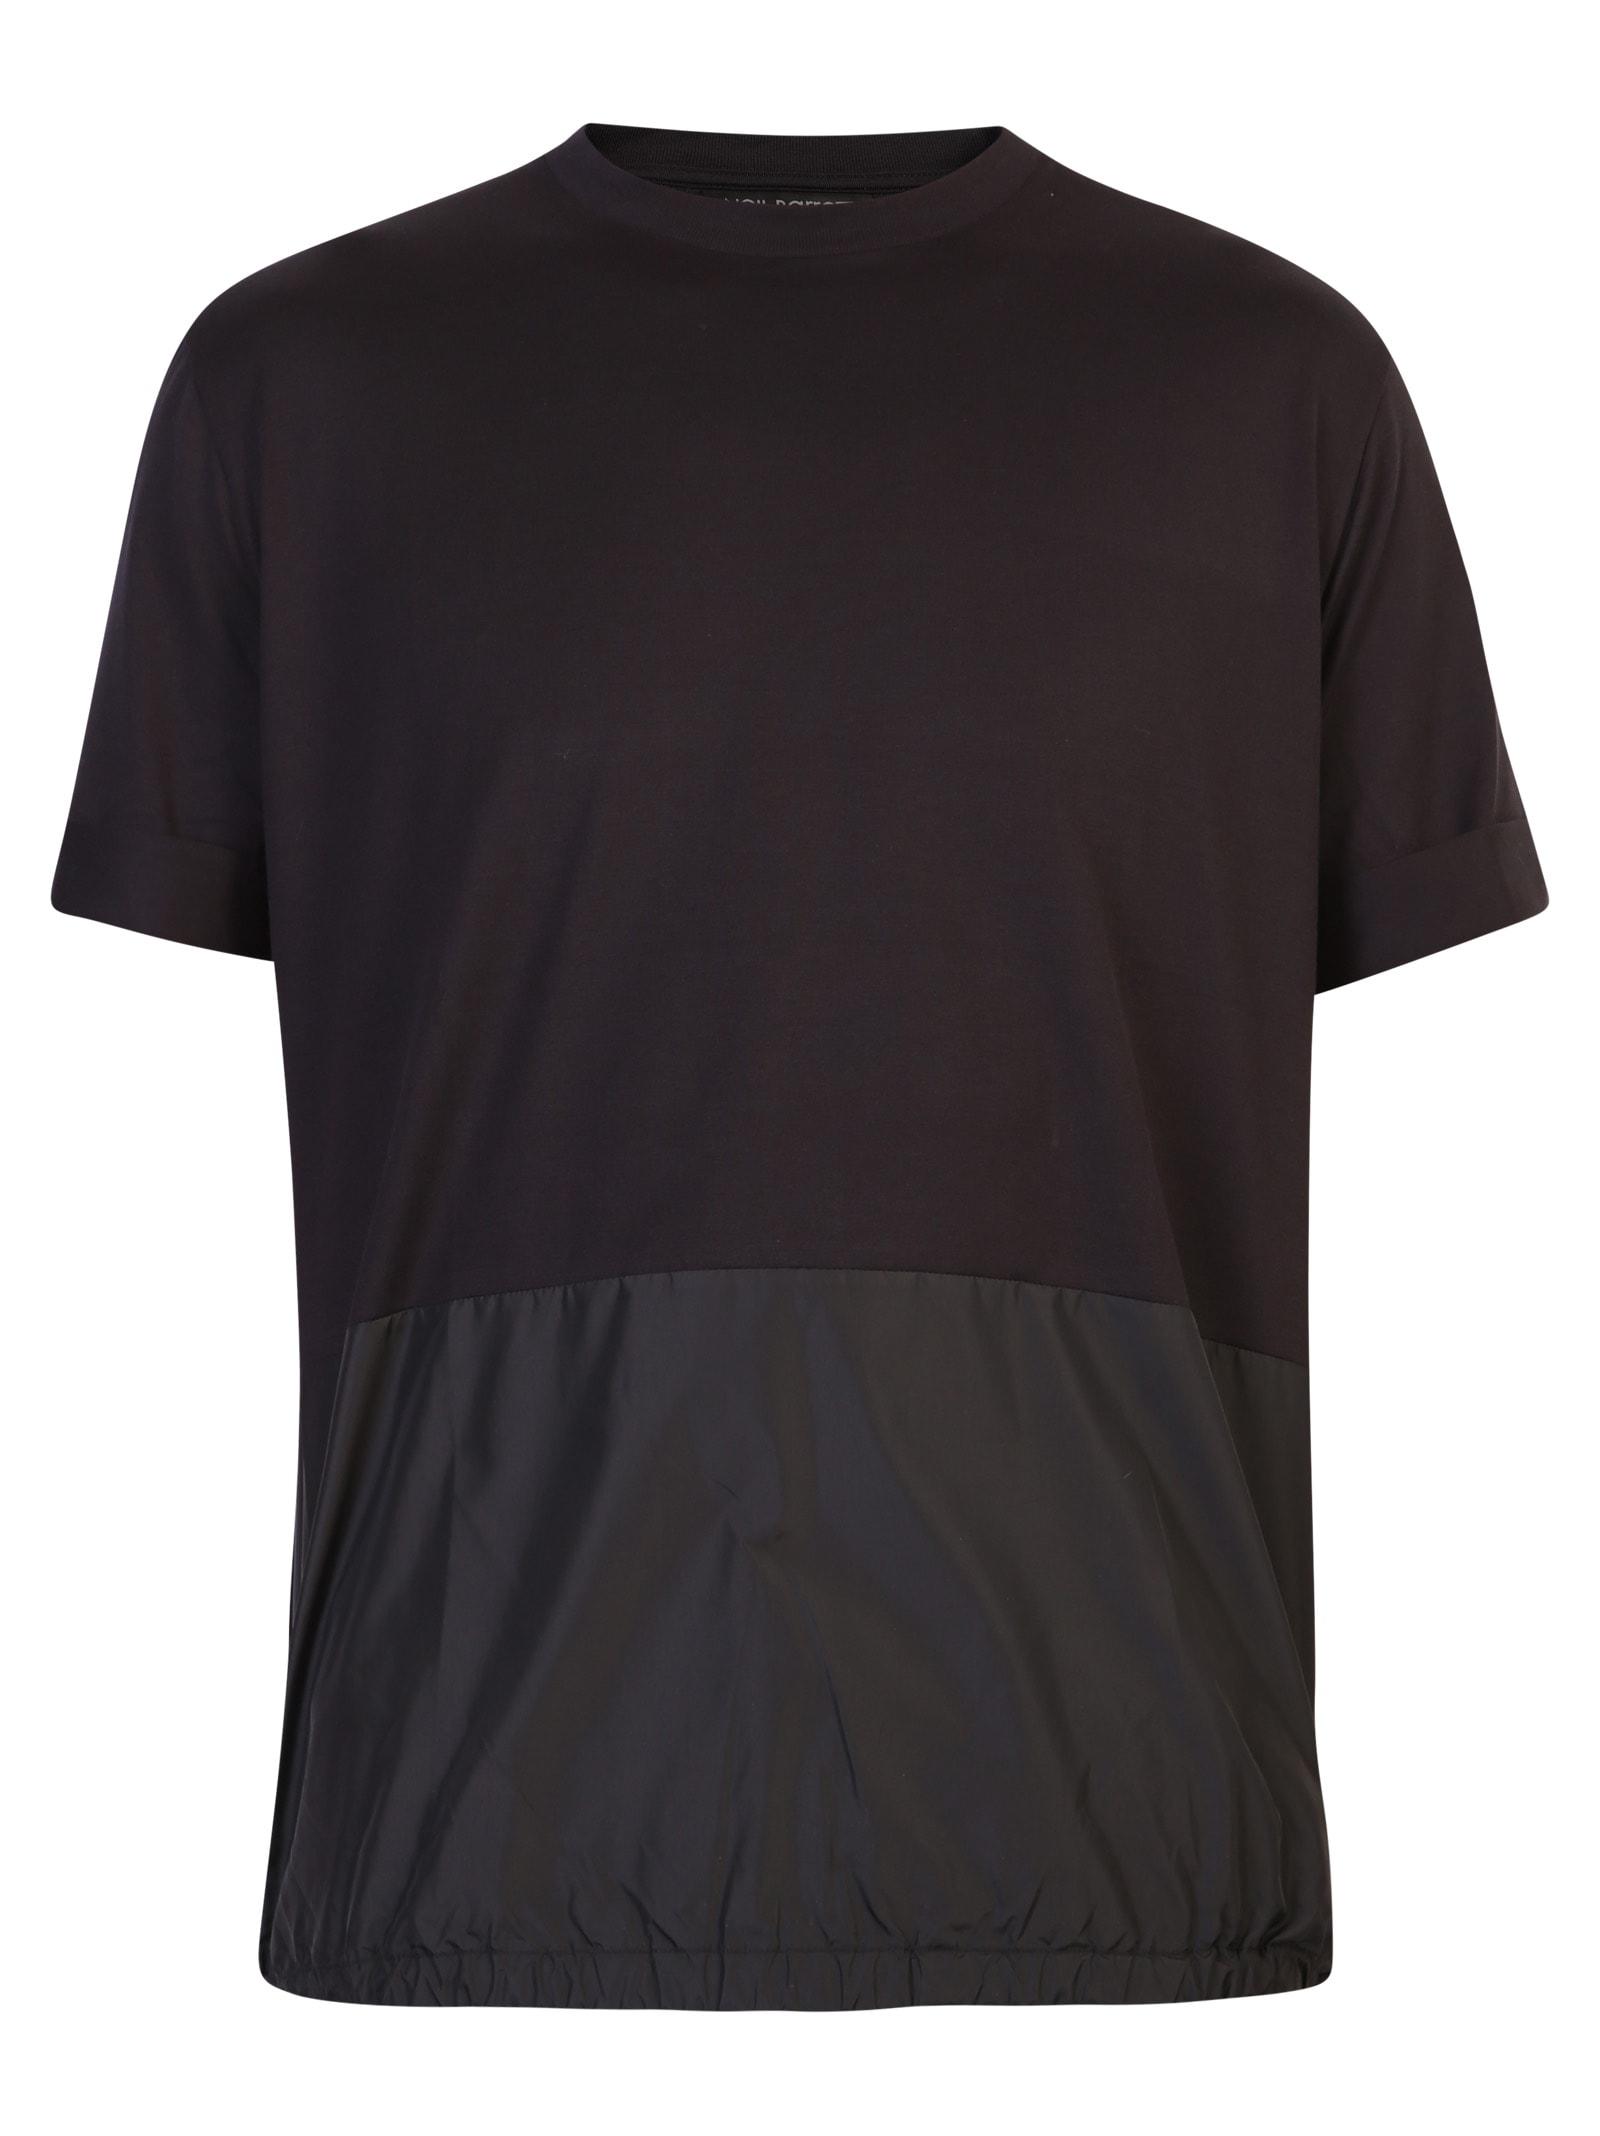 Neil Barrett Nylon And Cotton T-shirt In Black